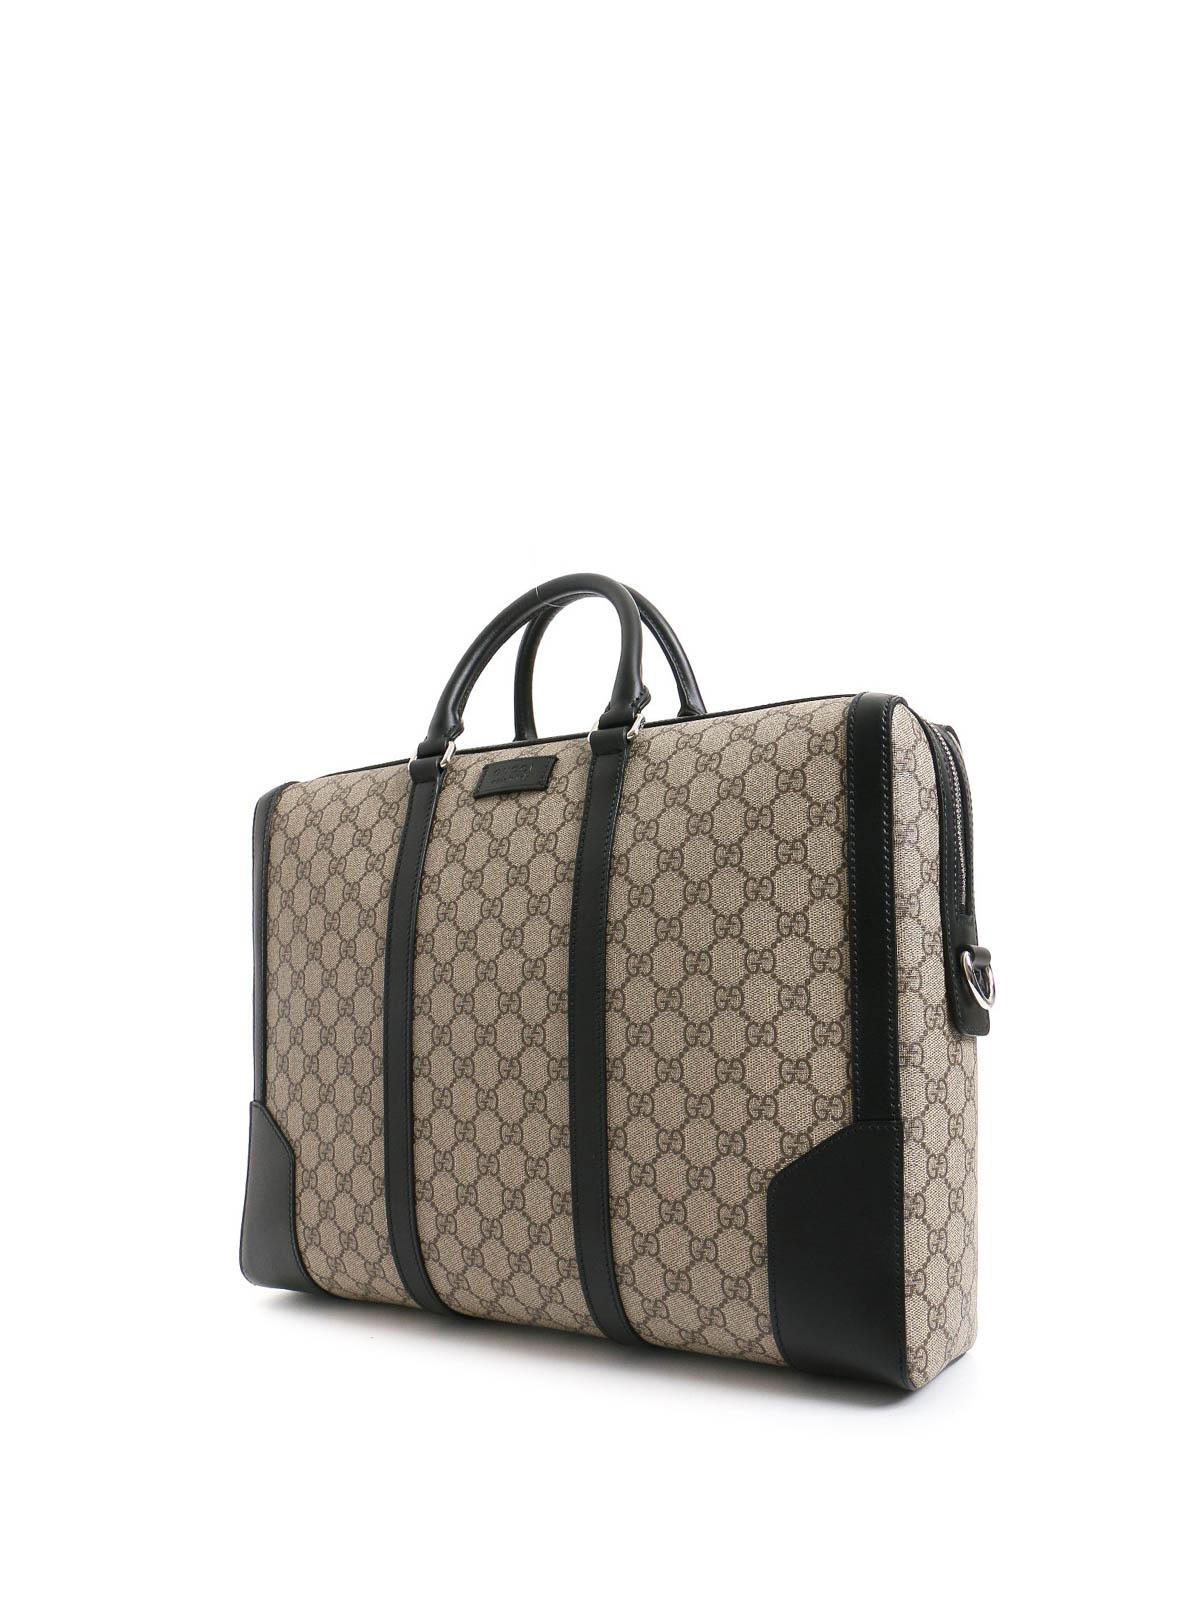 1200 x 1600 www.ikrix.com. GG supreme briefcase by Gucci - laptop bags ... 84bd361fa7307